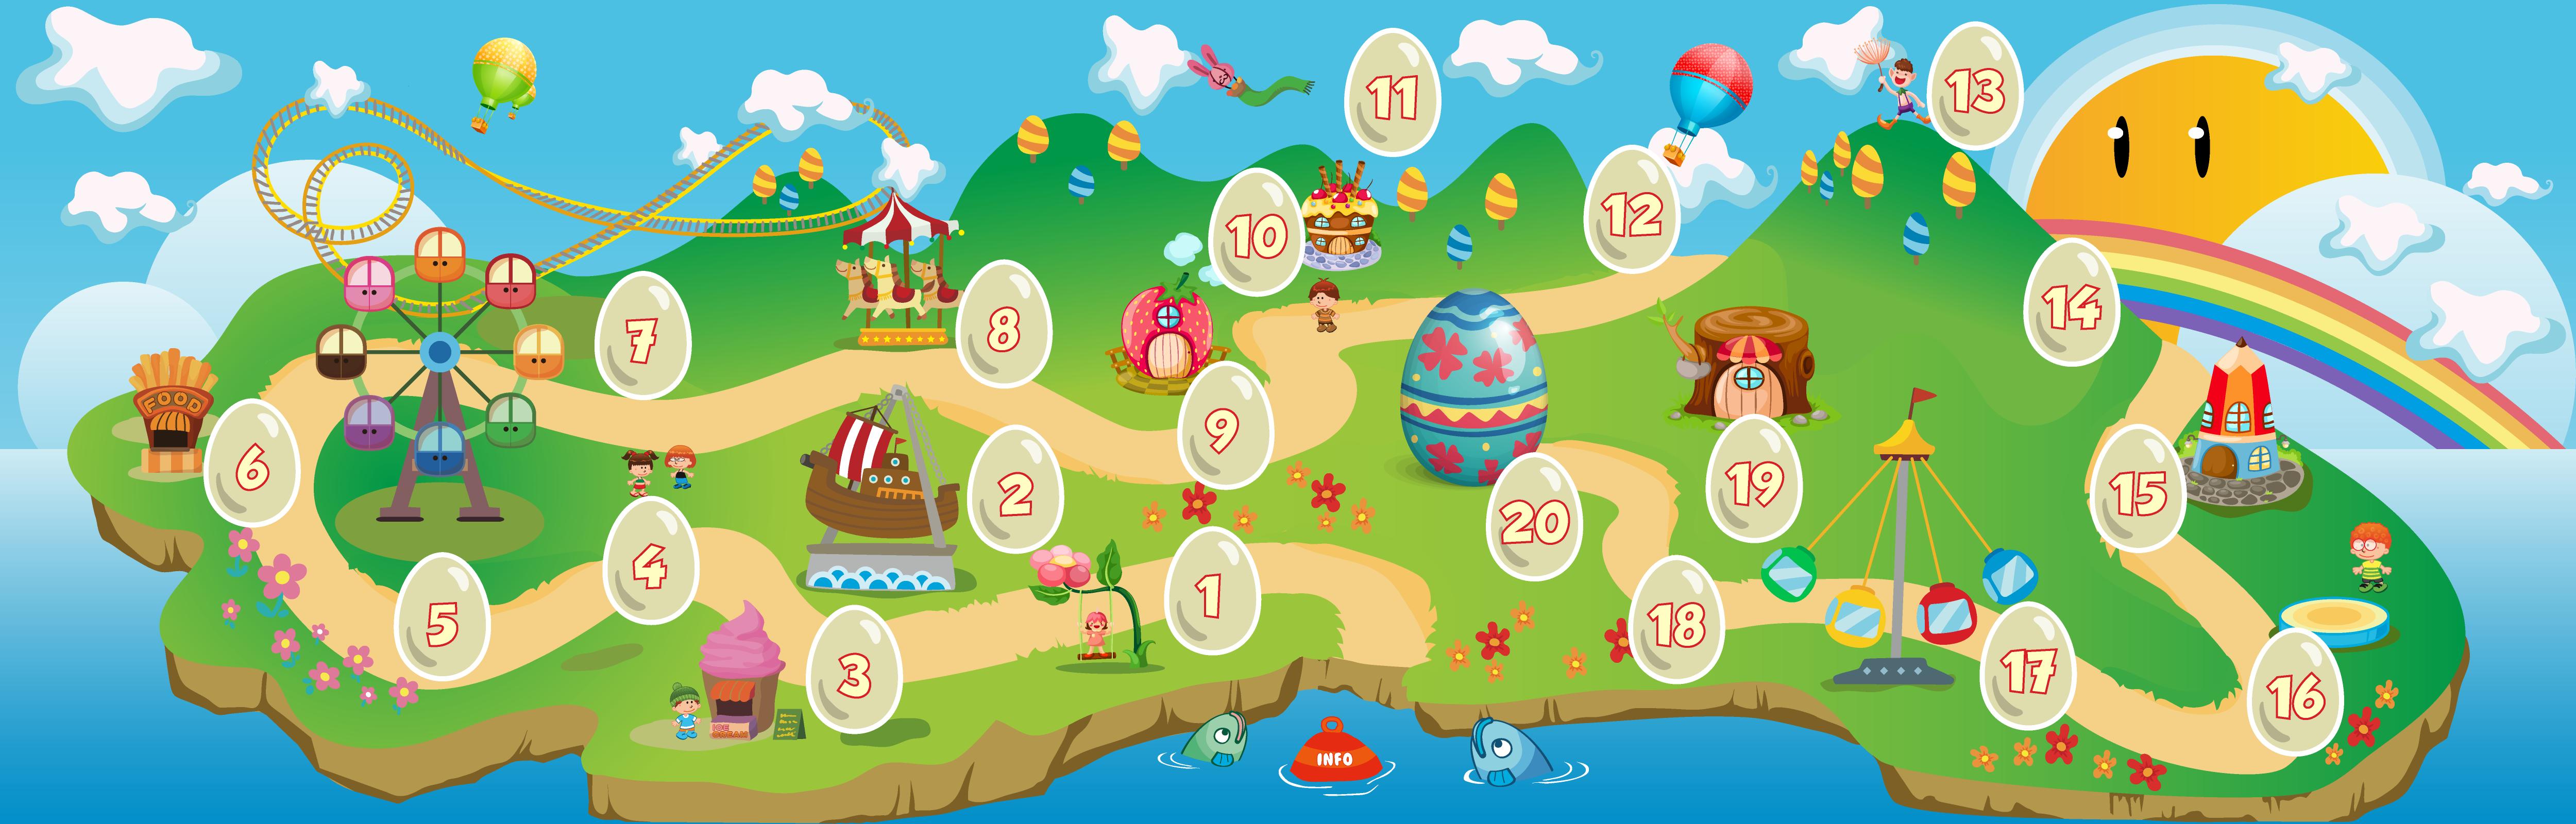 Easter Calendar 2014